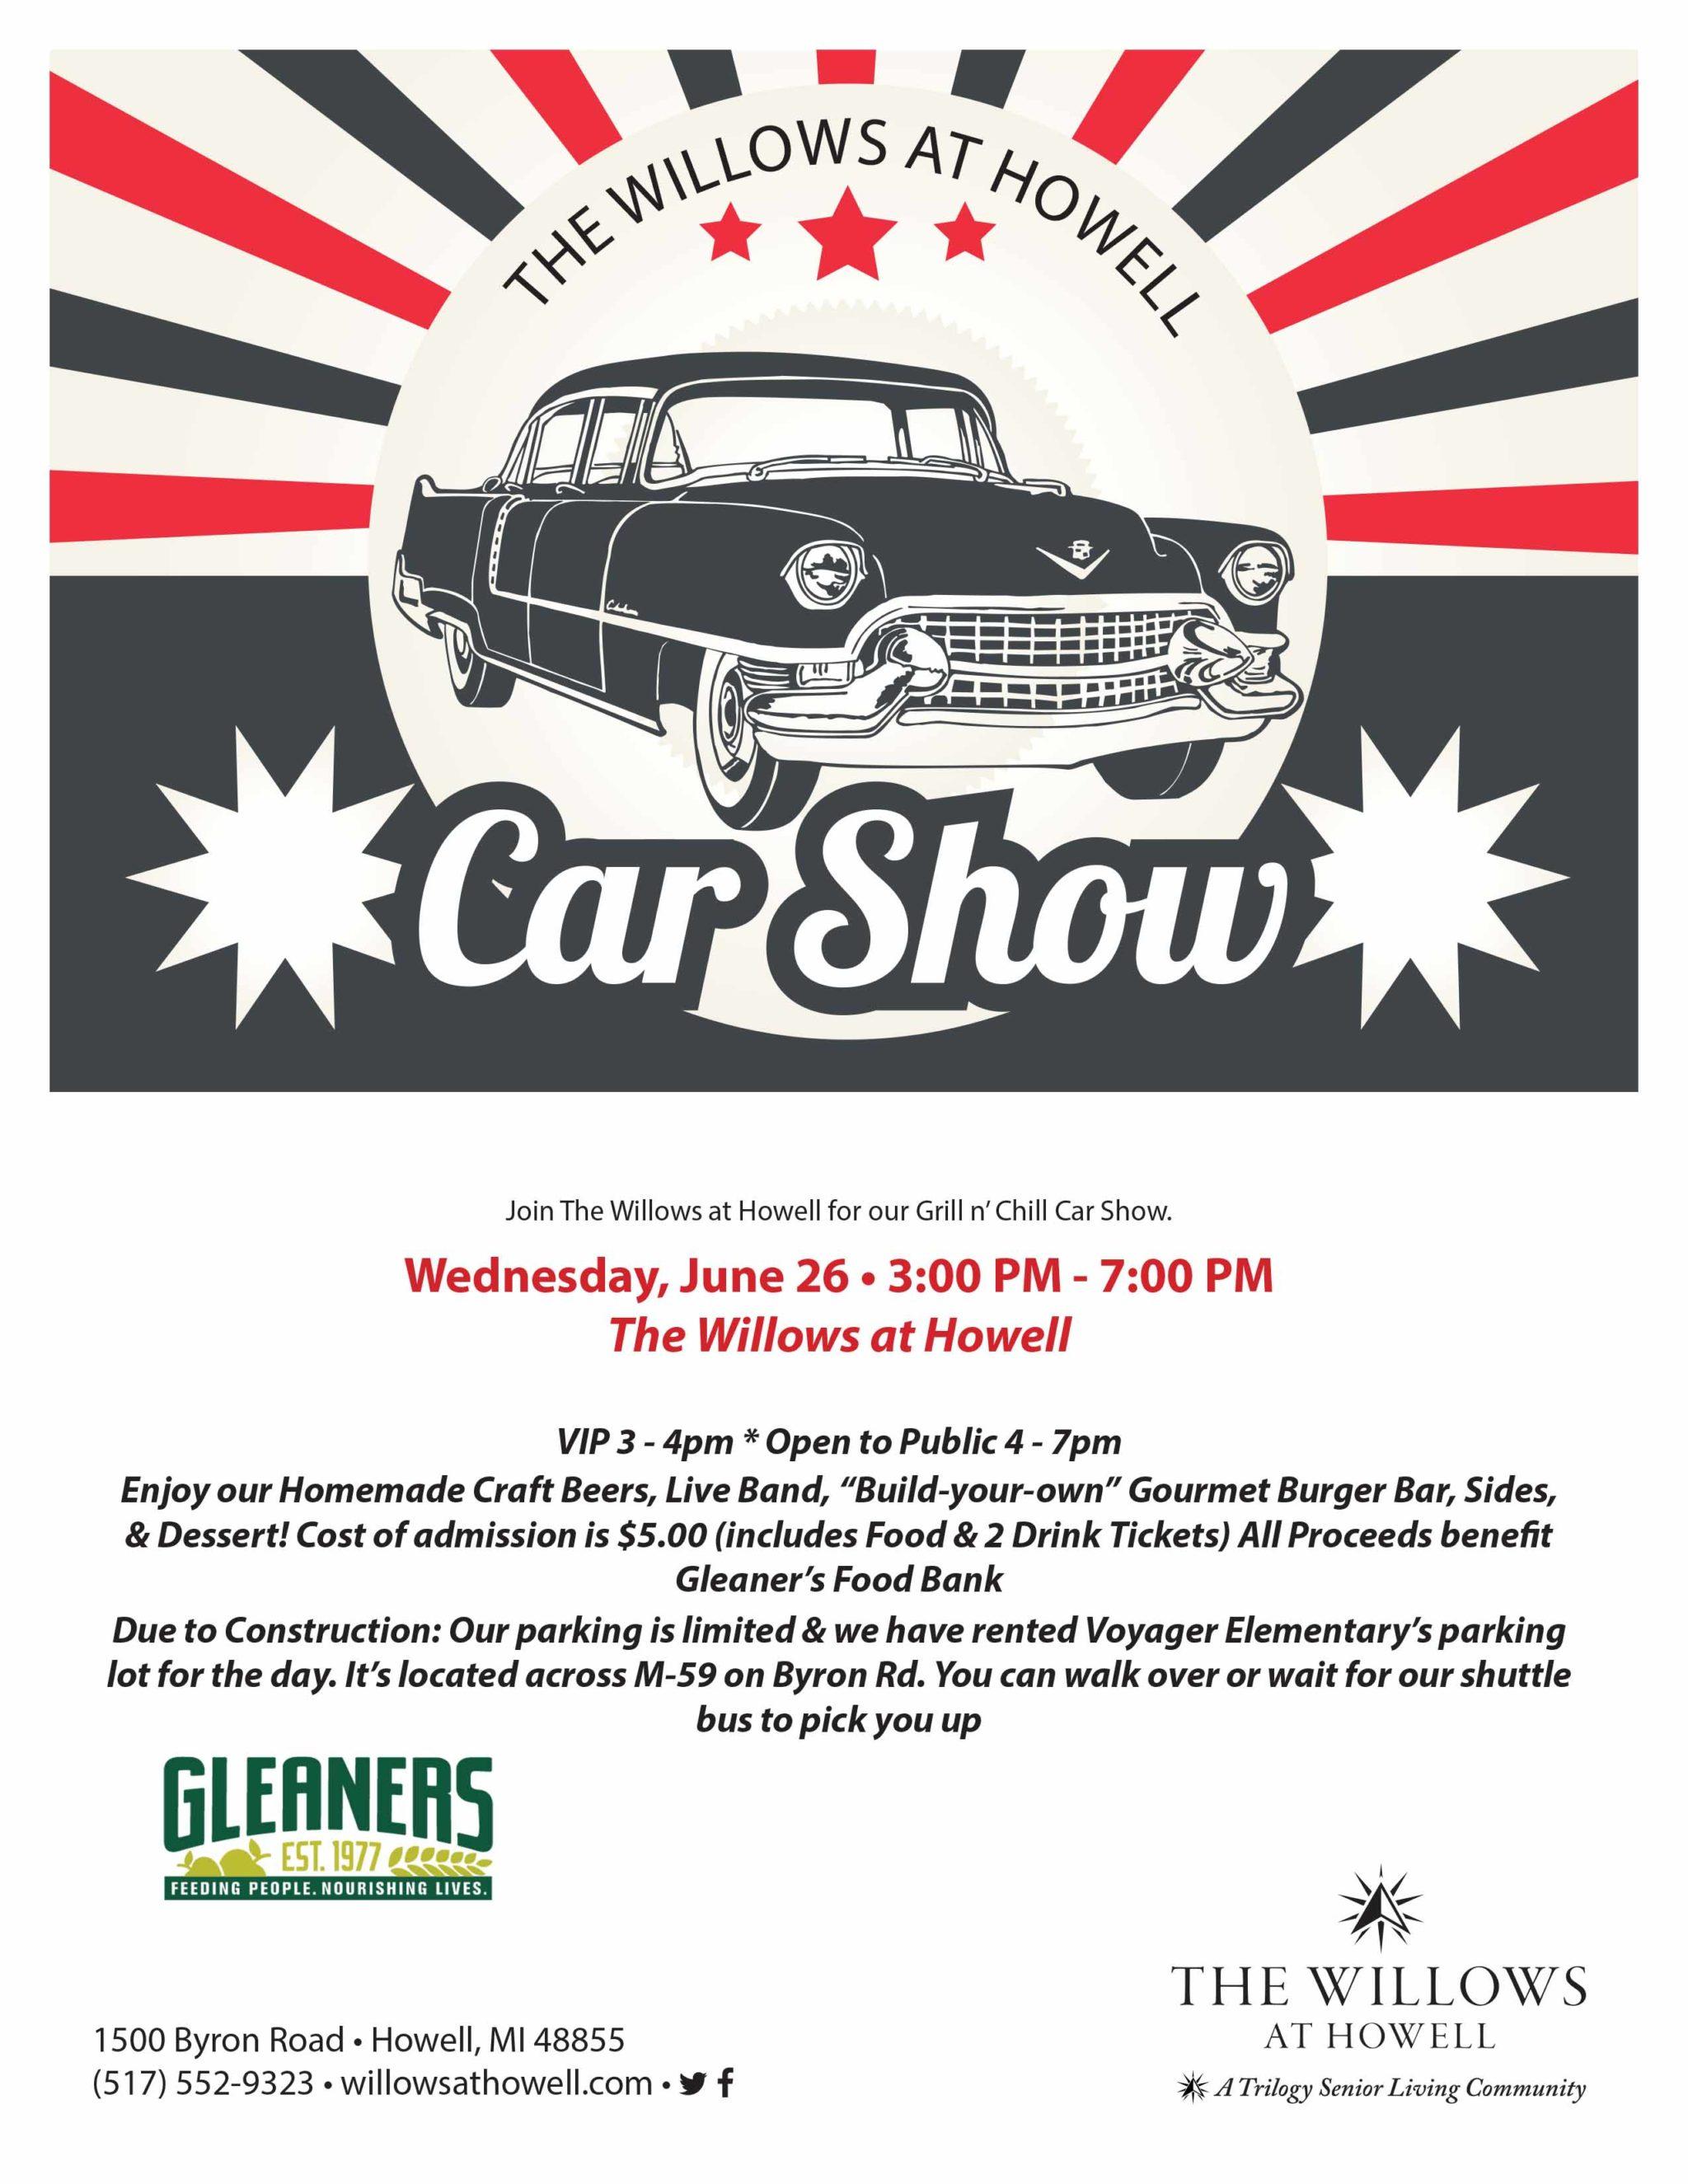 2019 Willows Car Show Flyer